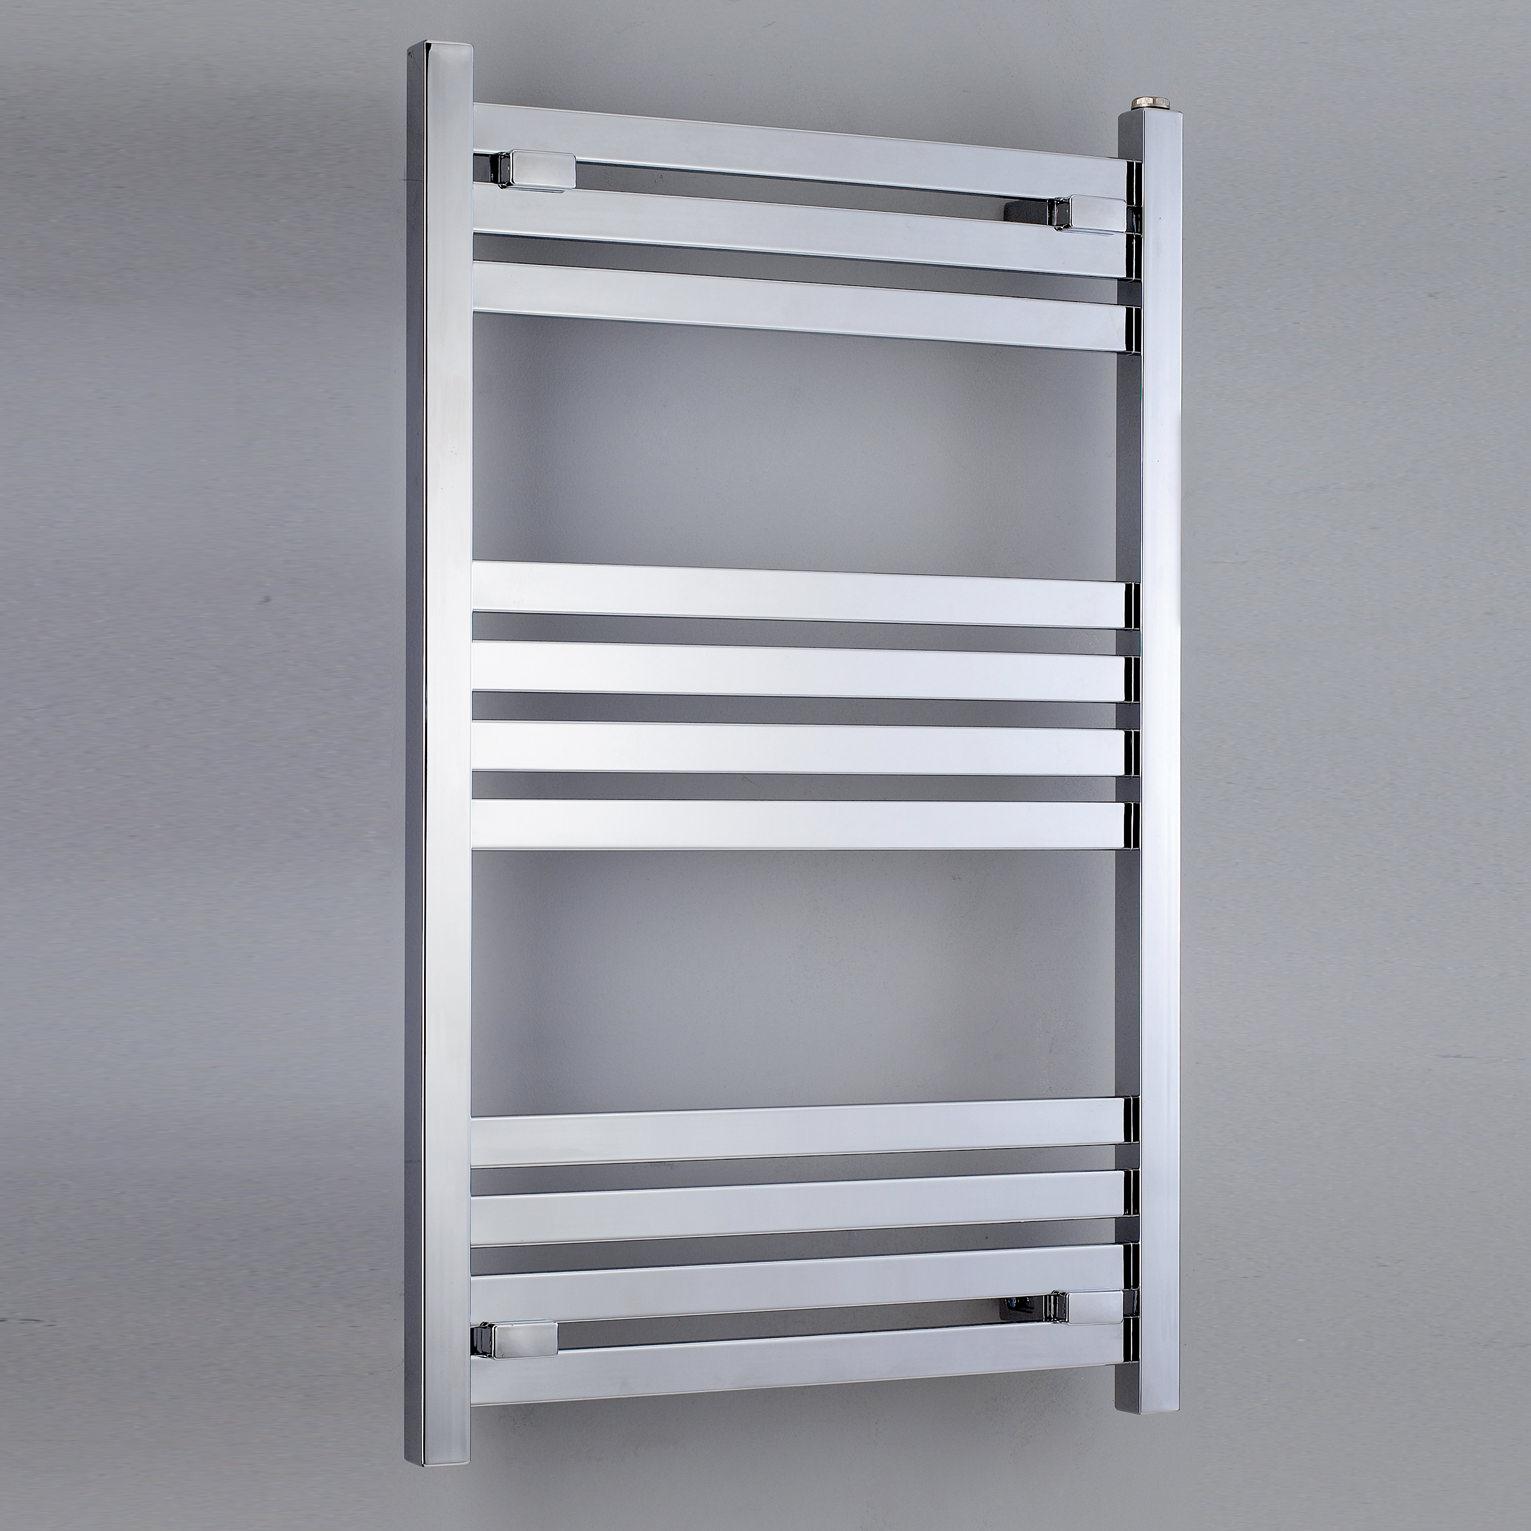 phoenix davina chrome 500 x 1200mm designer towel rail. Black Bedroom Furniture Sets. Home Design Ideas